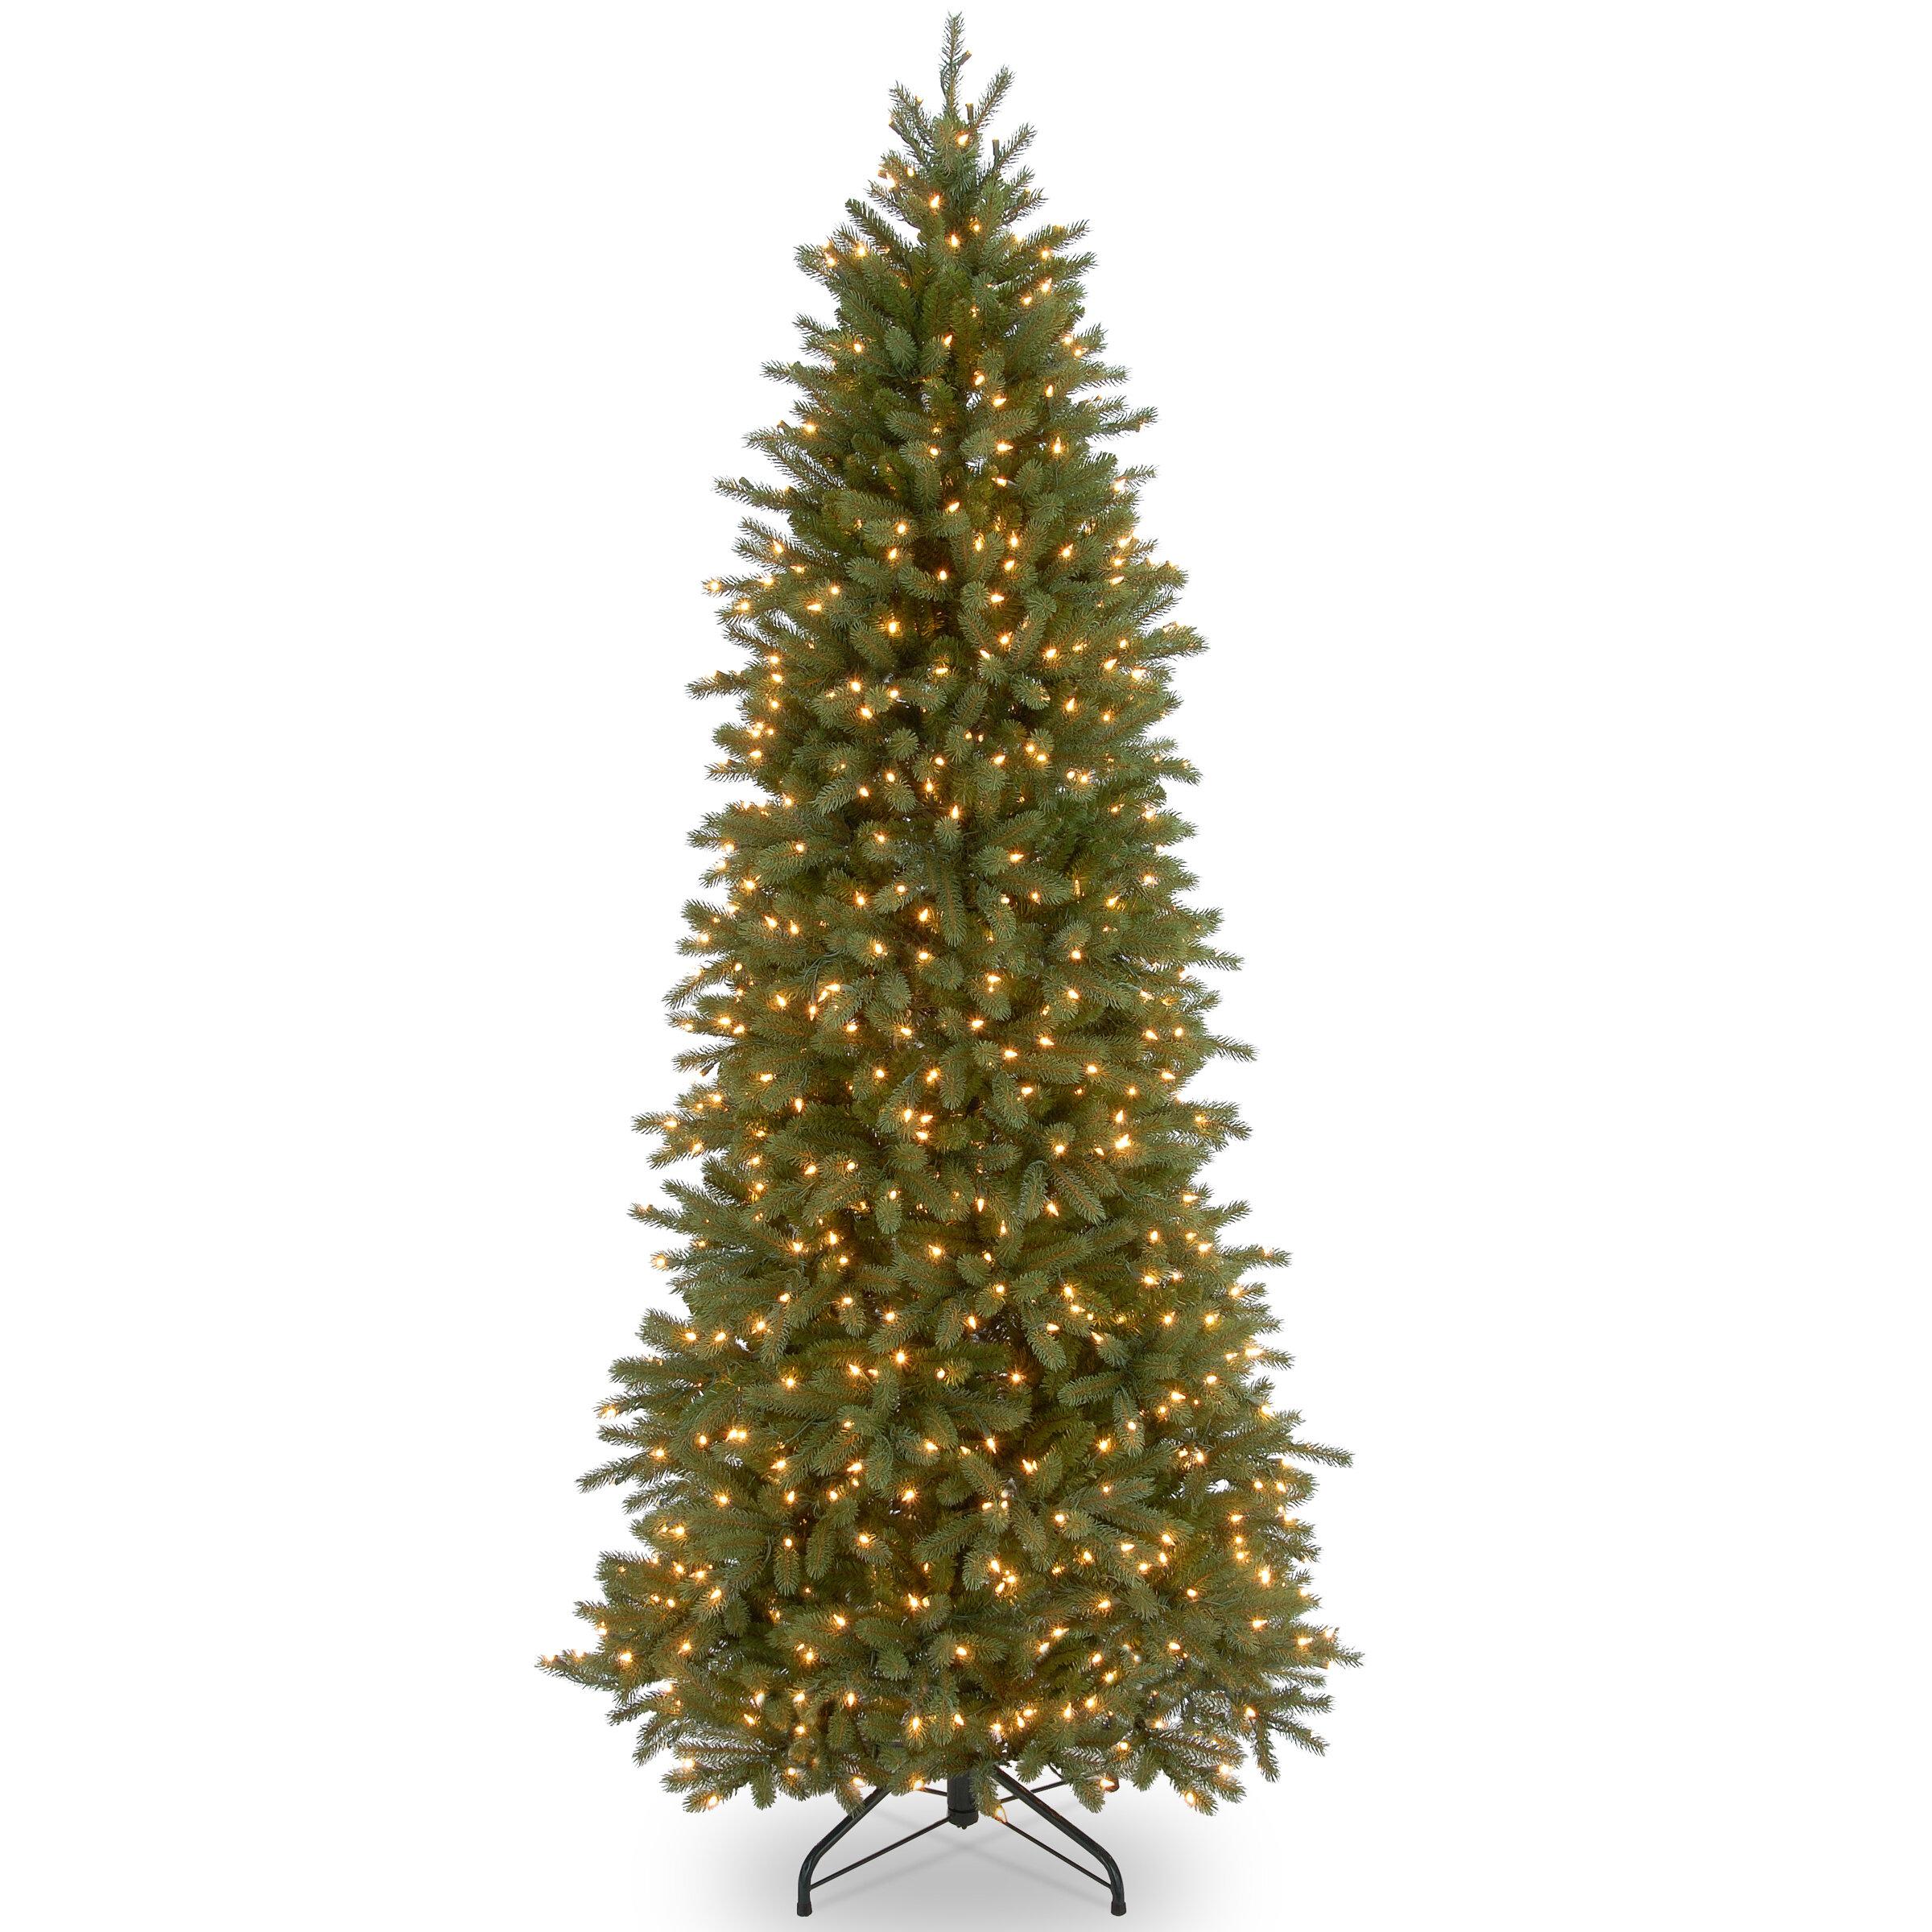 Jersey Fraser Green Fir Artificial Christmas Tree With Clear White Lights Reviews Joss Main